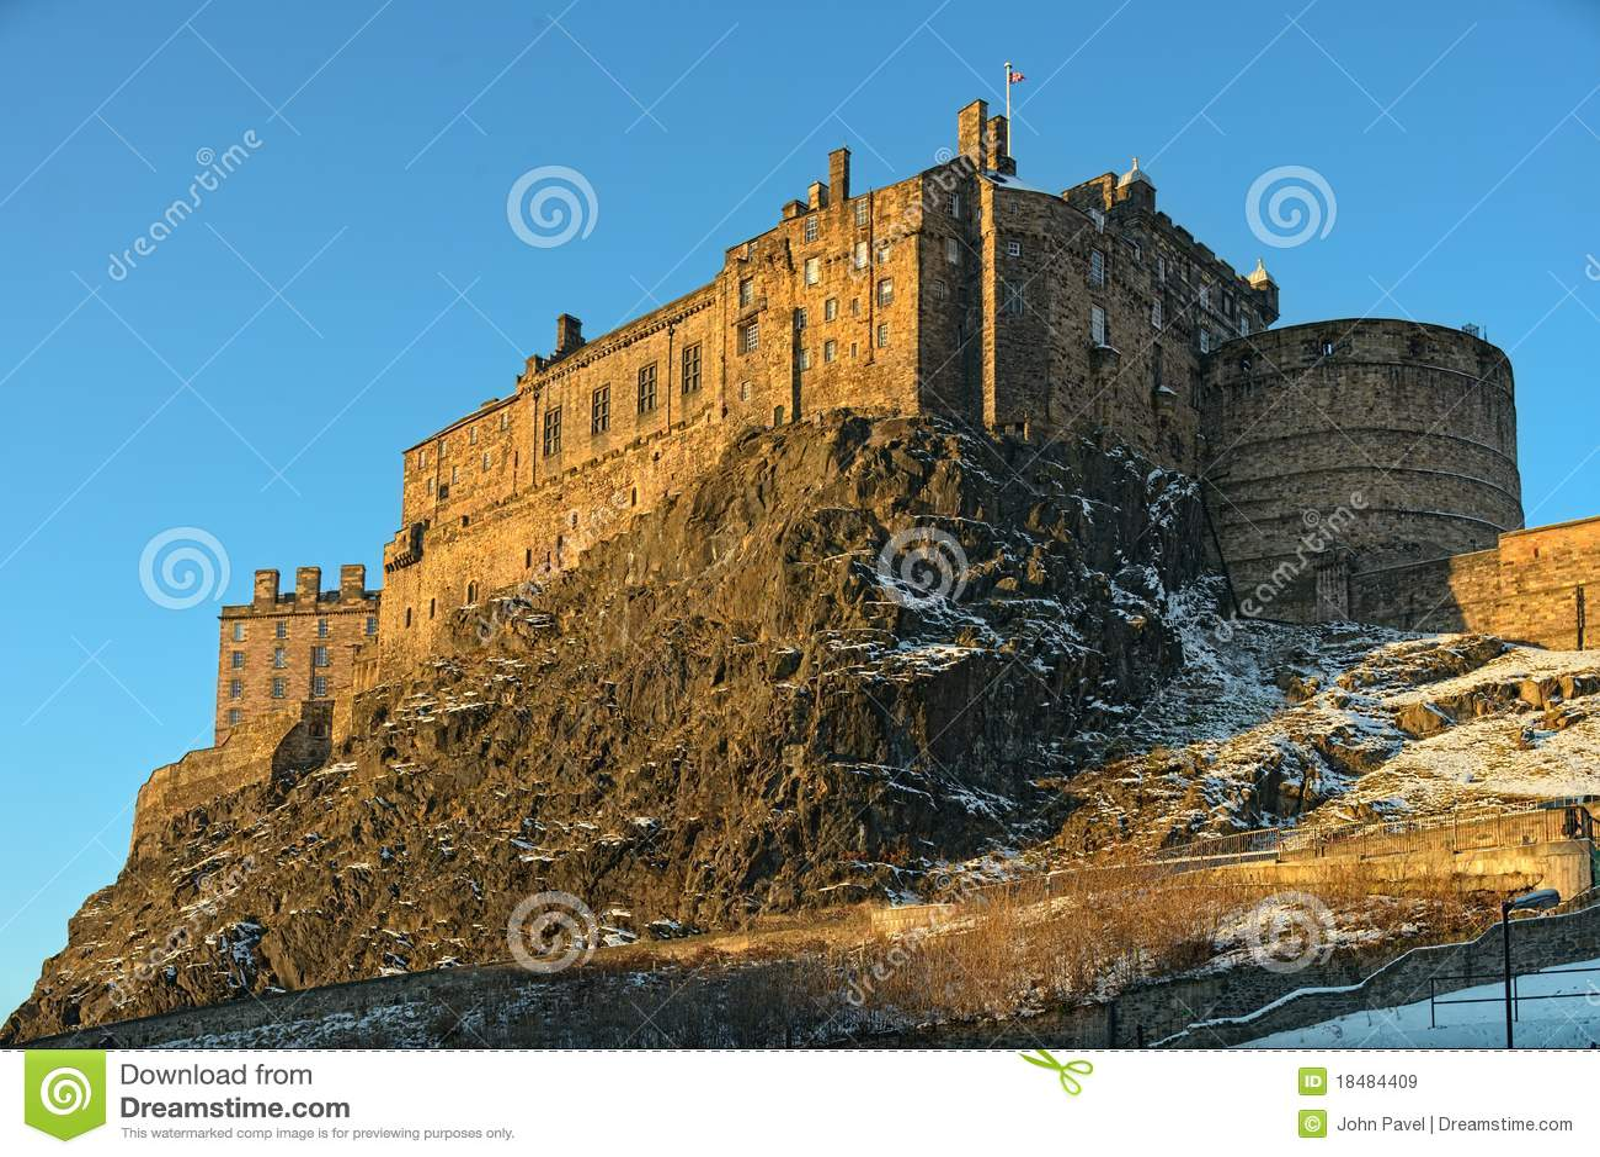 Edinburgh Castle, Scotland, UK, in winter light